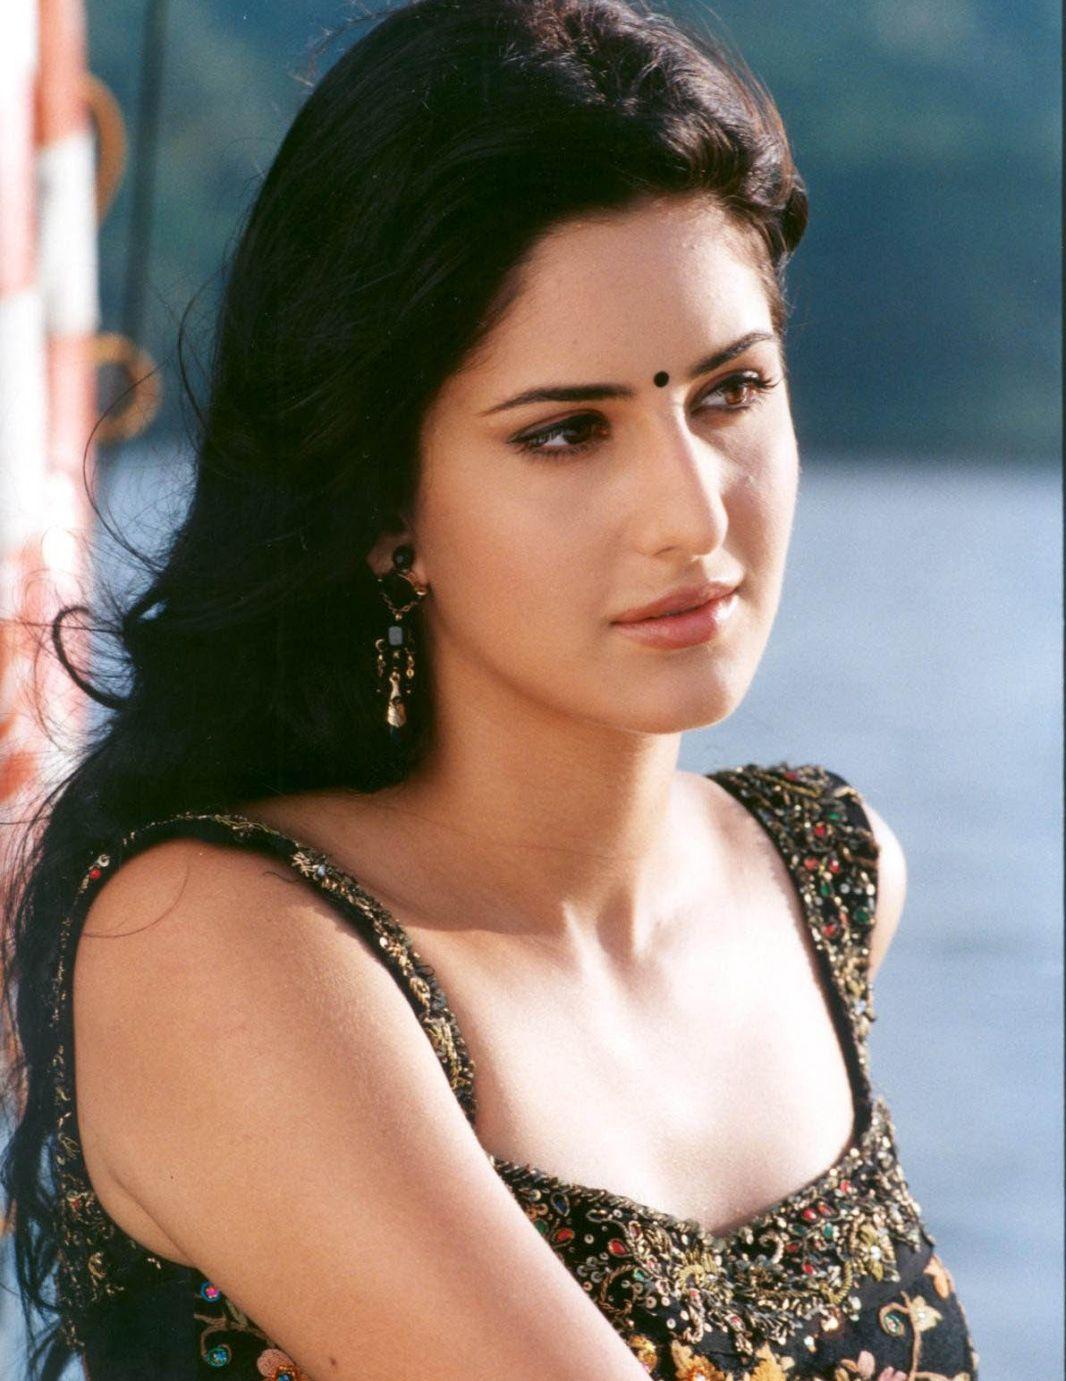 Pin by 𝐌𝑜𝑜𝑛𝐋𝑖𝑔ℎ𝑡 on Katrina Kaif   Indian bollywood